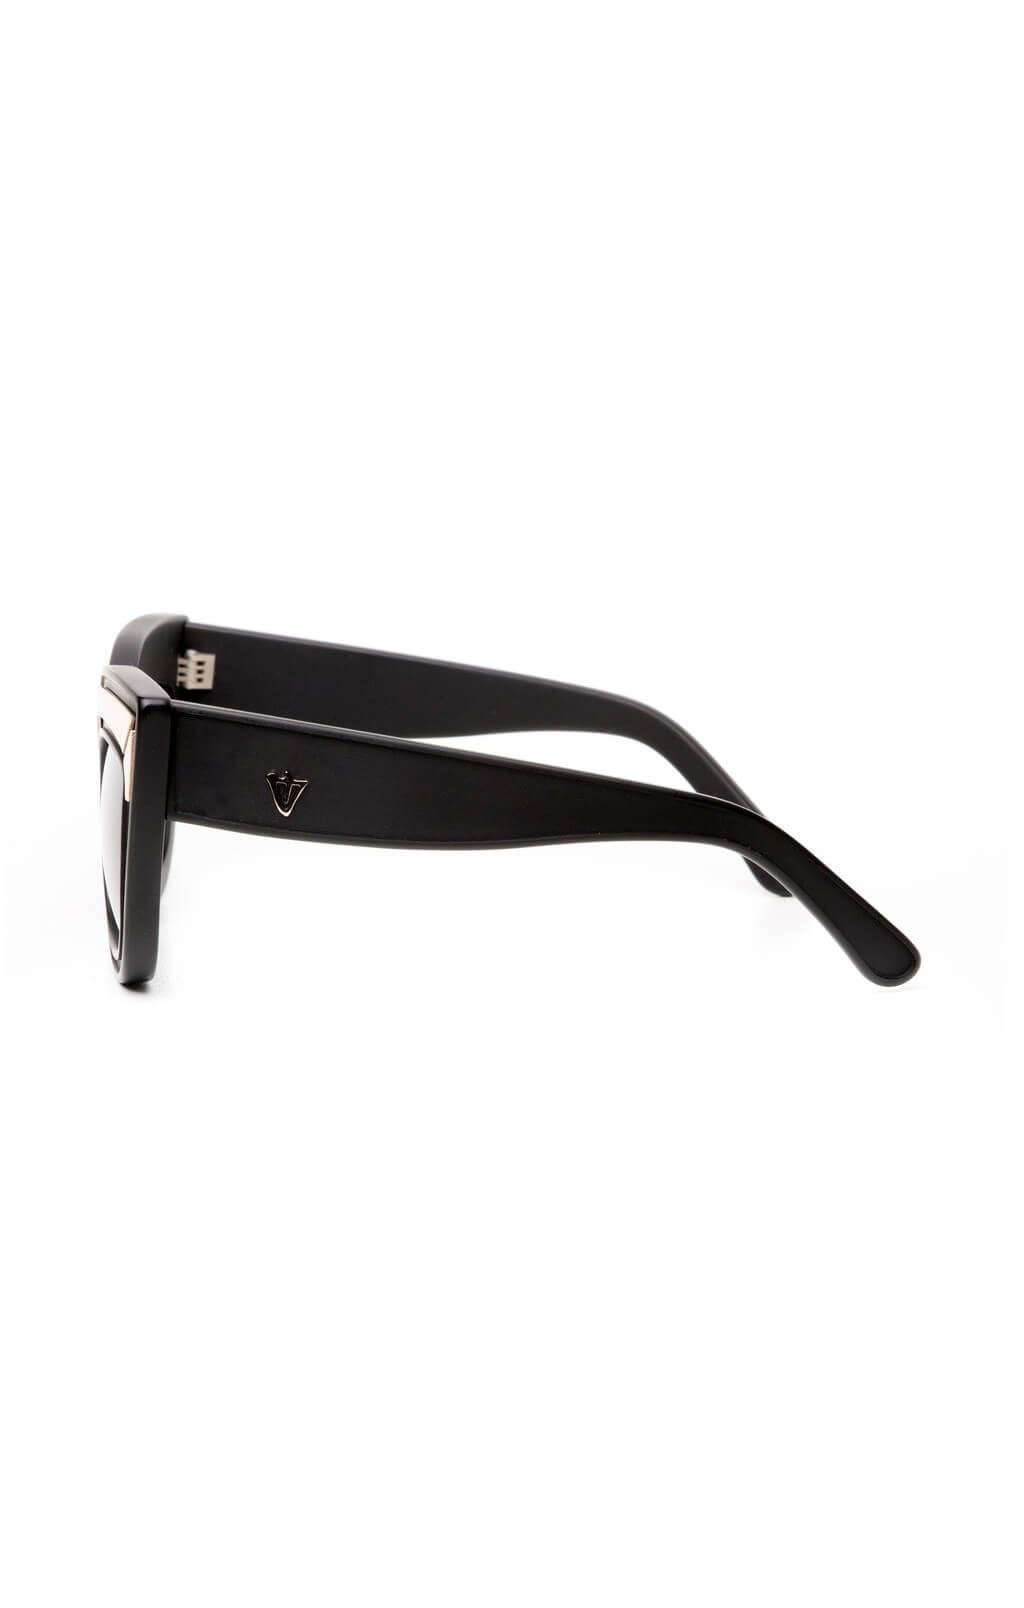 valley eyewear marmont sunglasses matte black gold trim